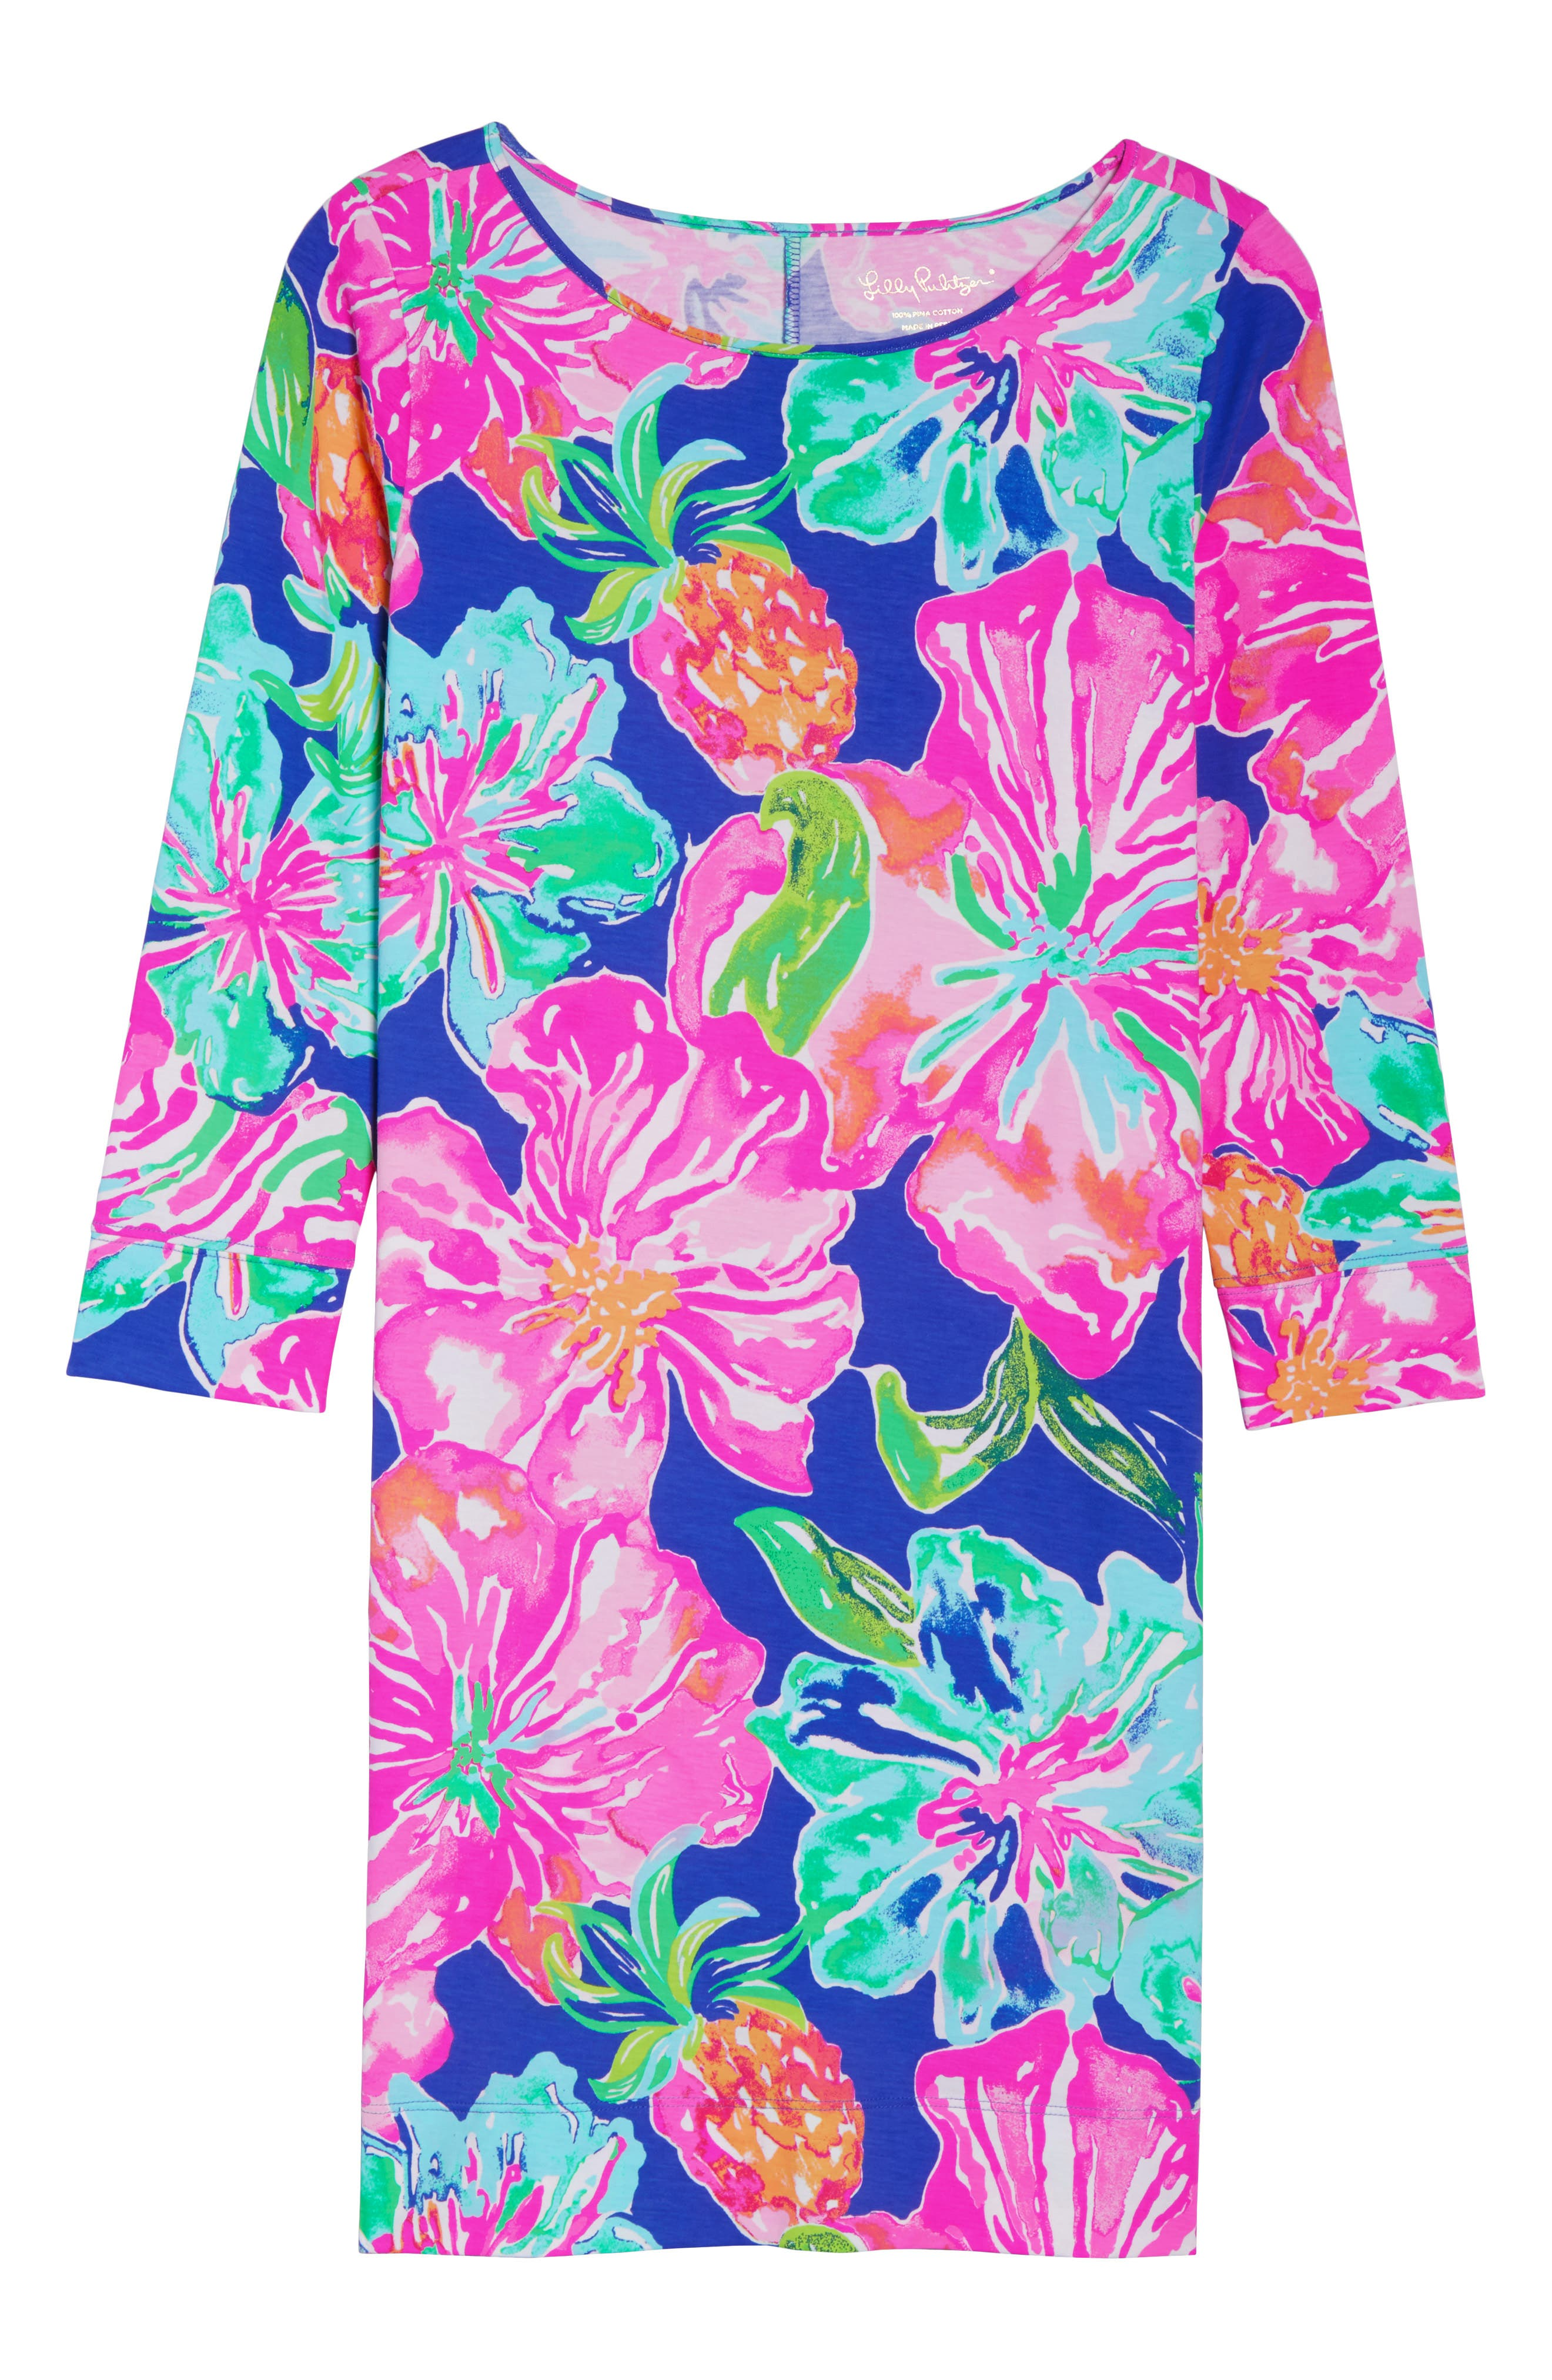 Marlowe Shift Dress,                             Alternate thumbnail 7, color,                             BECKON BLUE JUNGLE UTOPIA